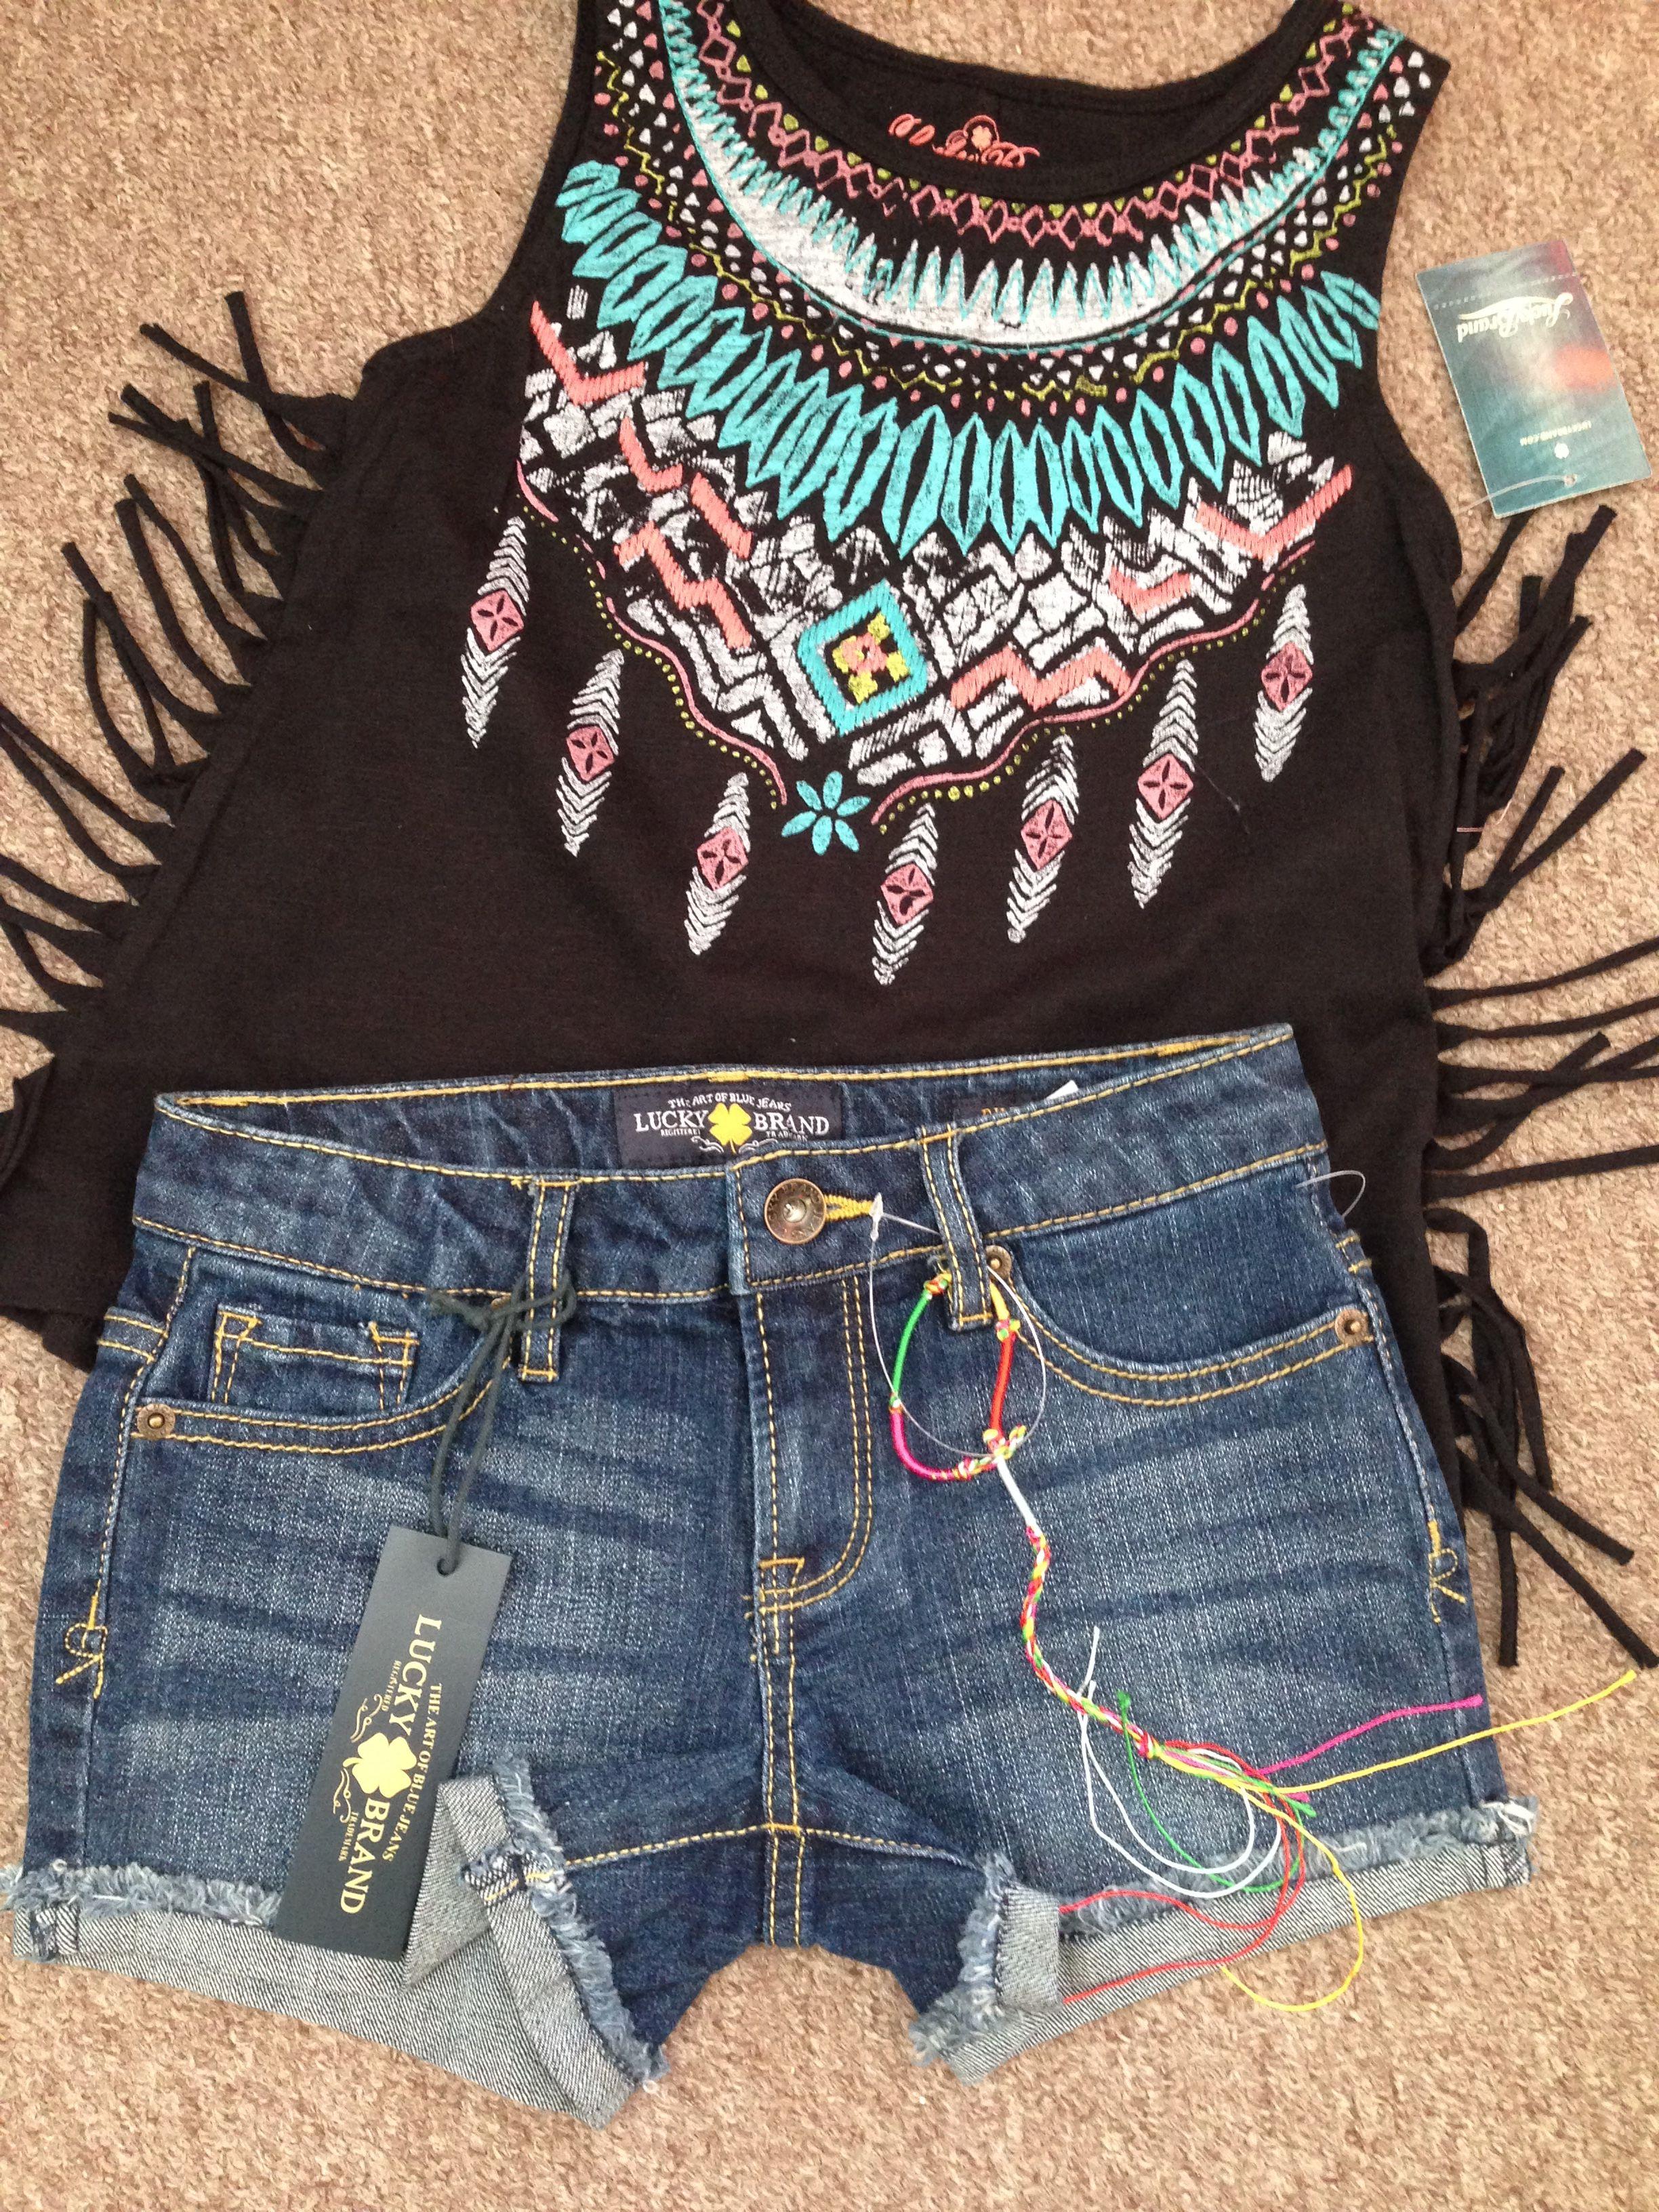 LUCKY BRAND SPRING/SUMMER 2015 Teenage Fashion • Teen